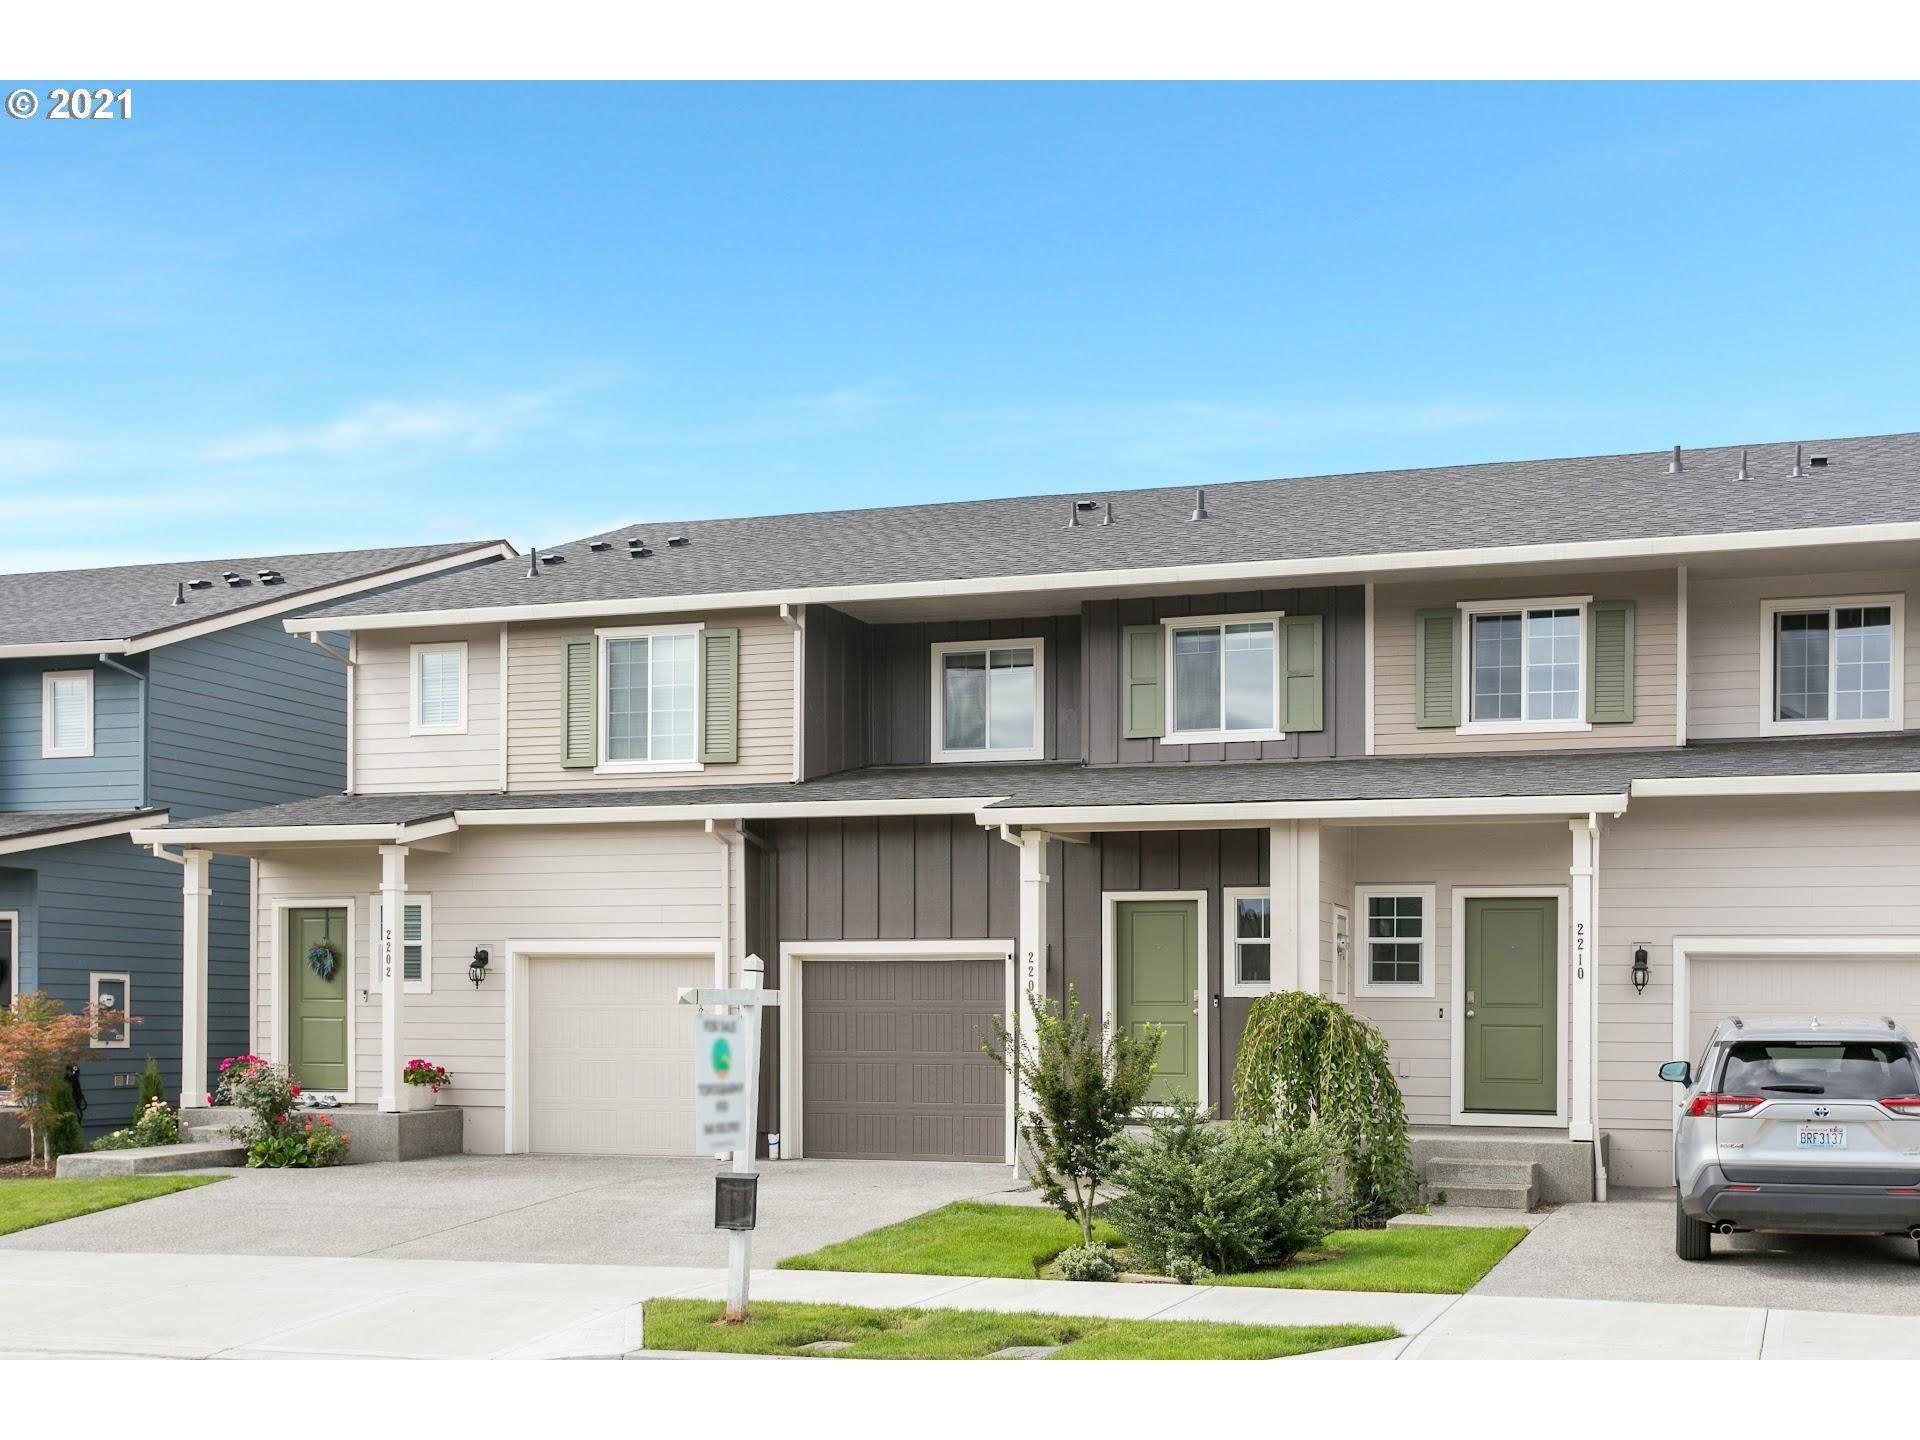 2206 NE 115TH CT, Vancouver, WA 98684 - MLS#: 21129033